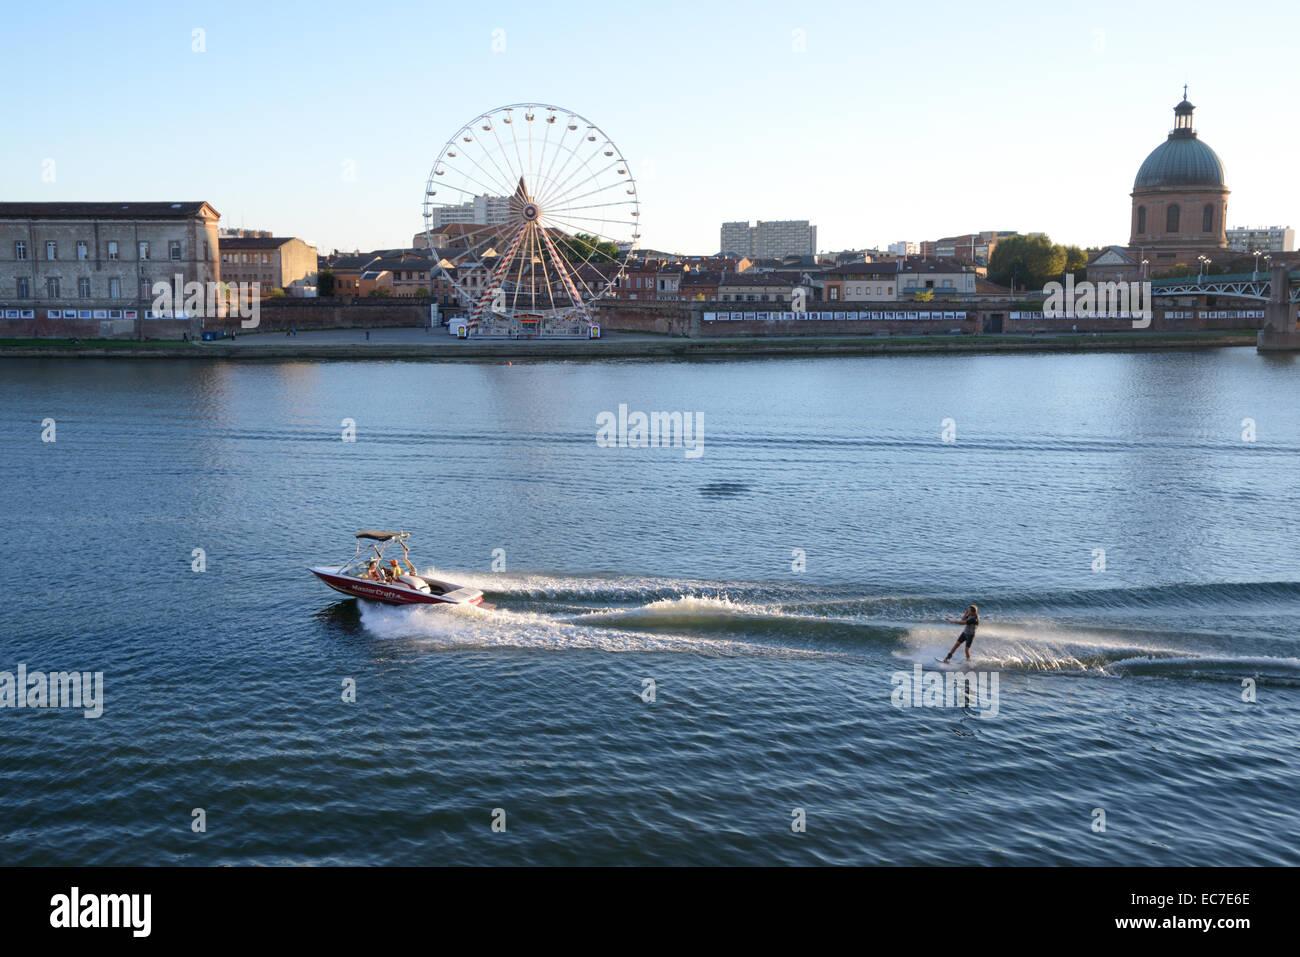 Water Skiing on River Garonne Toulouse Haute-Garonne France - Stock Image